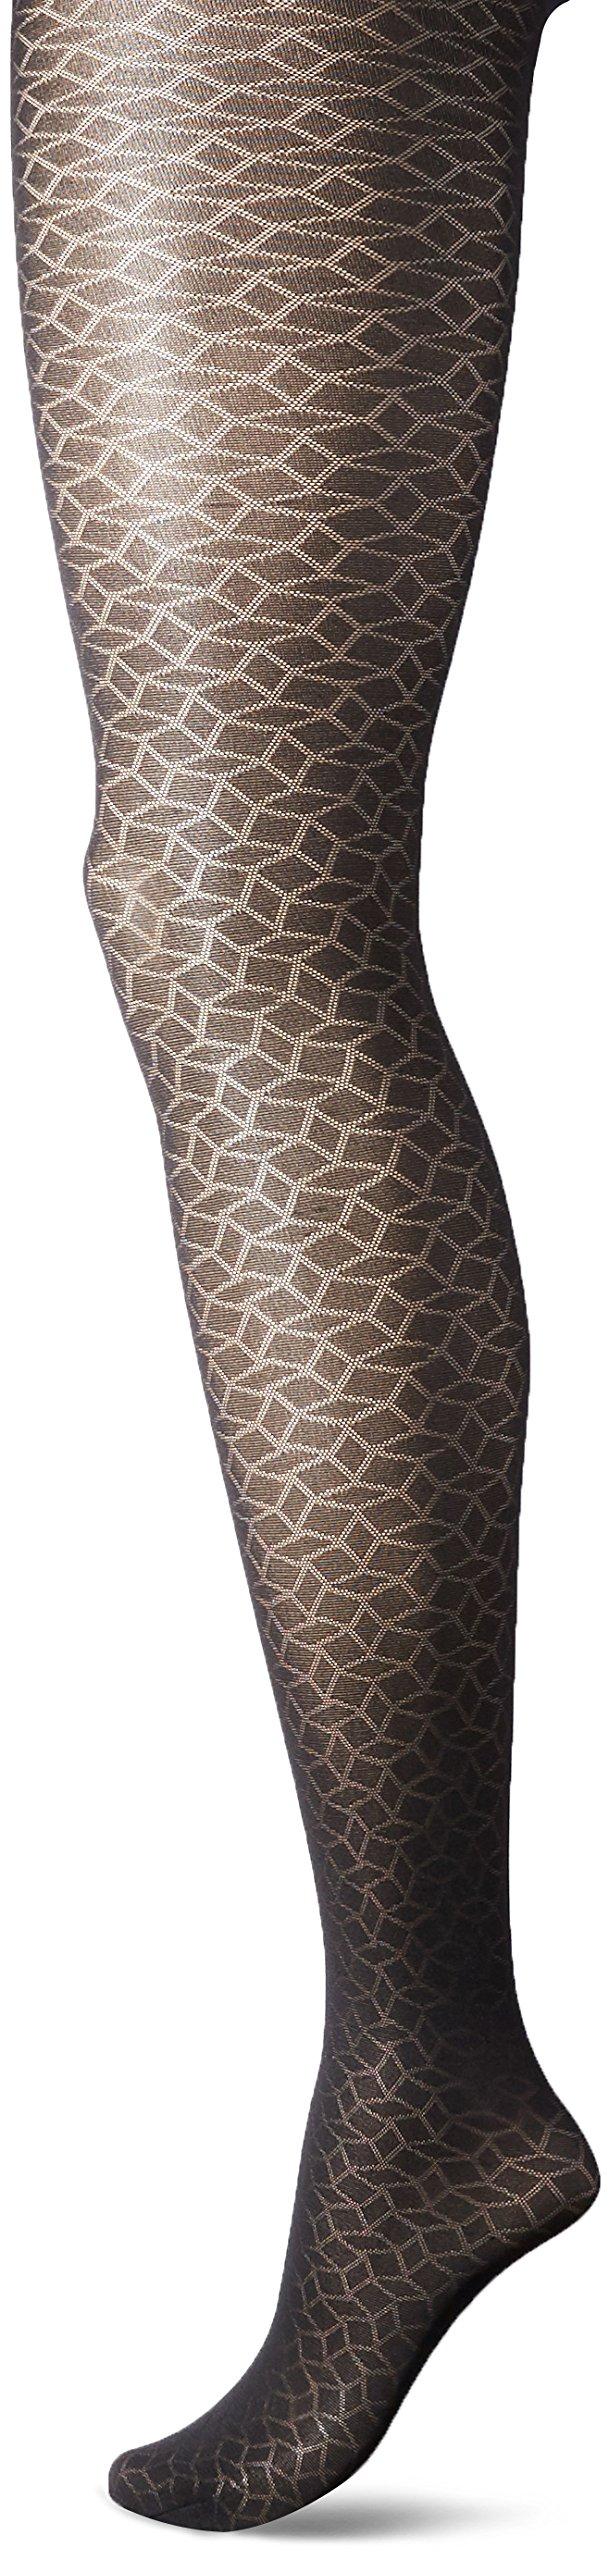 Yummie Women's Tights, Semi-Sheer Texture - Black, Large